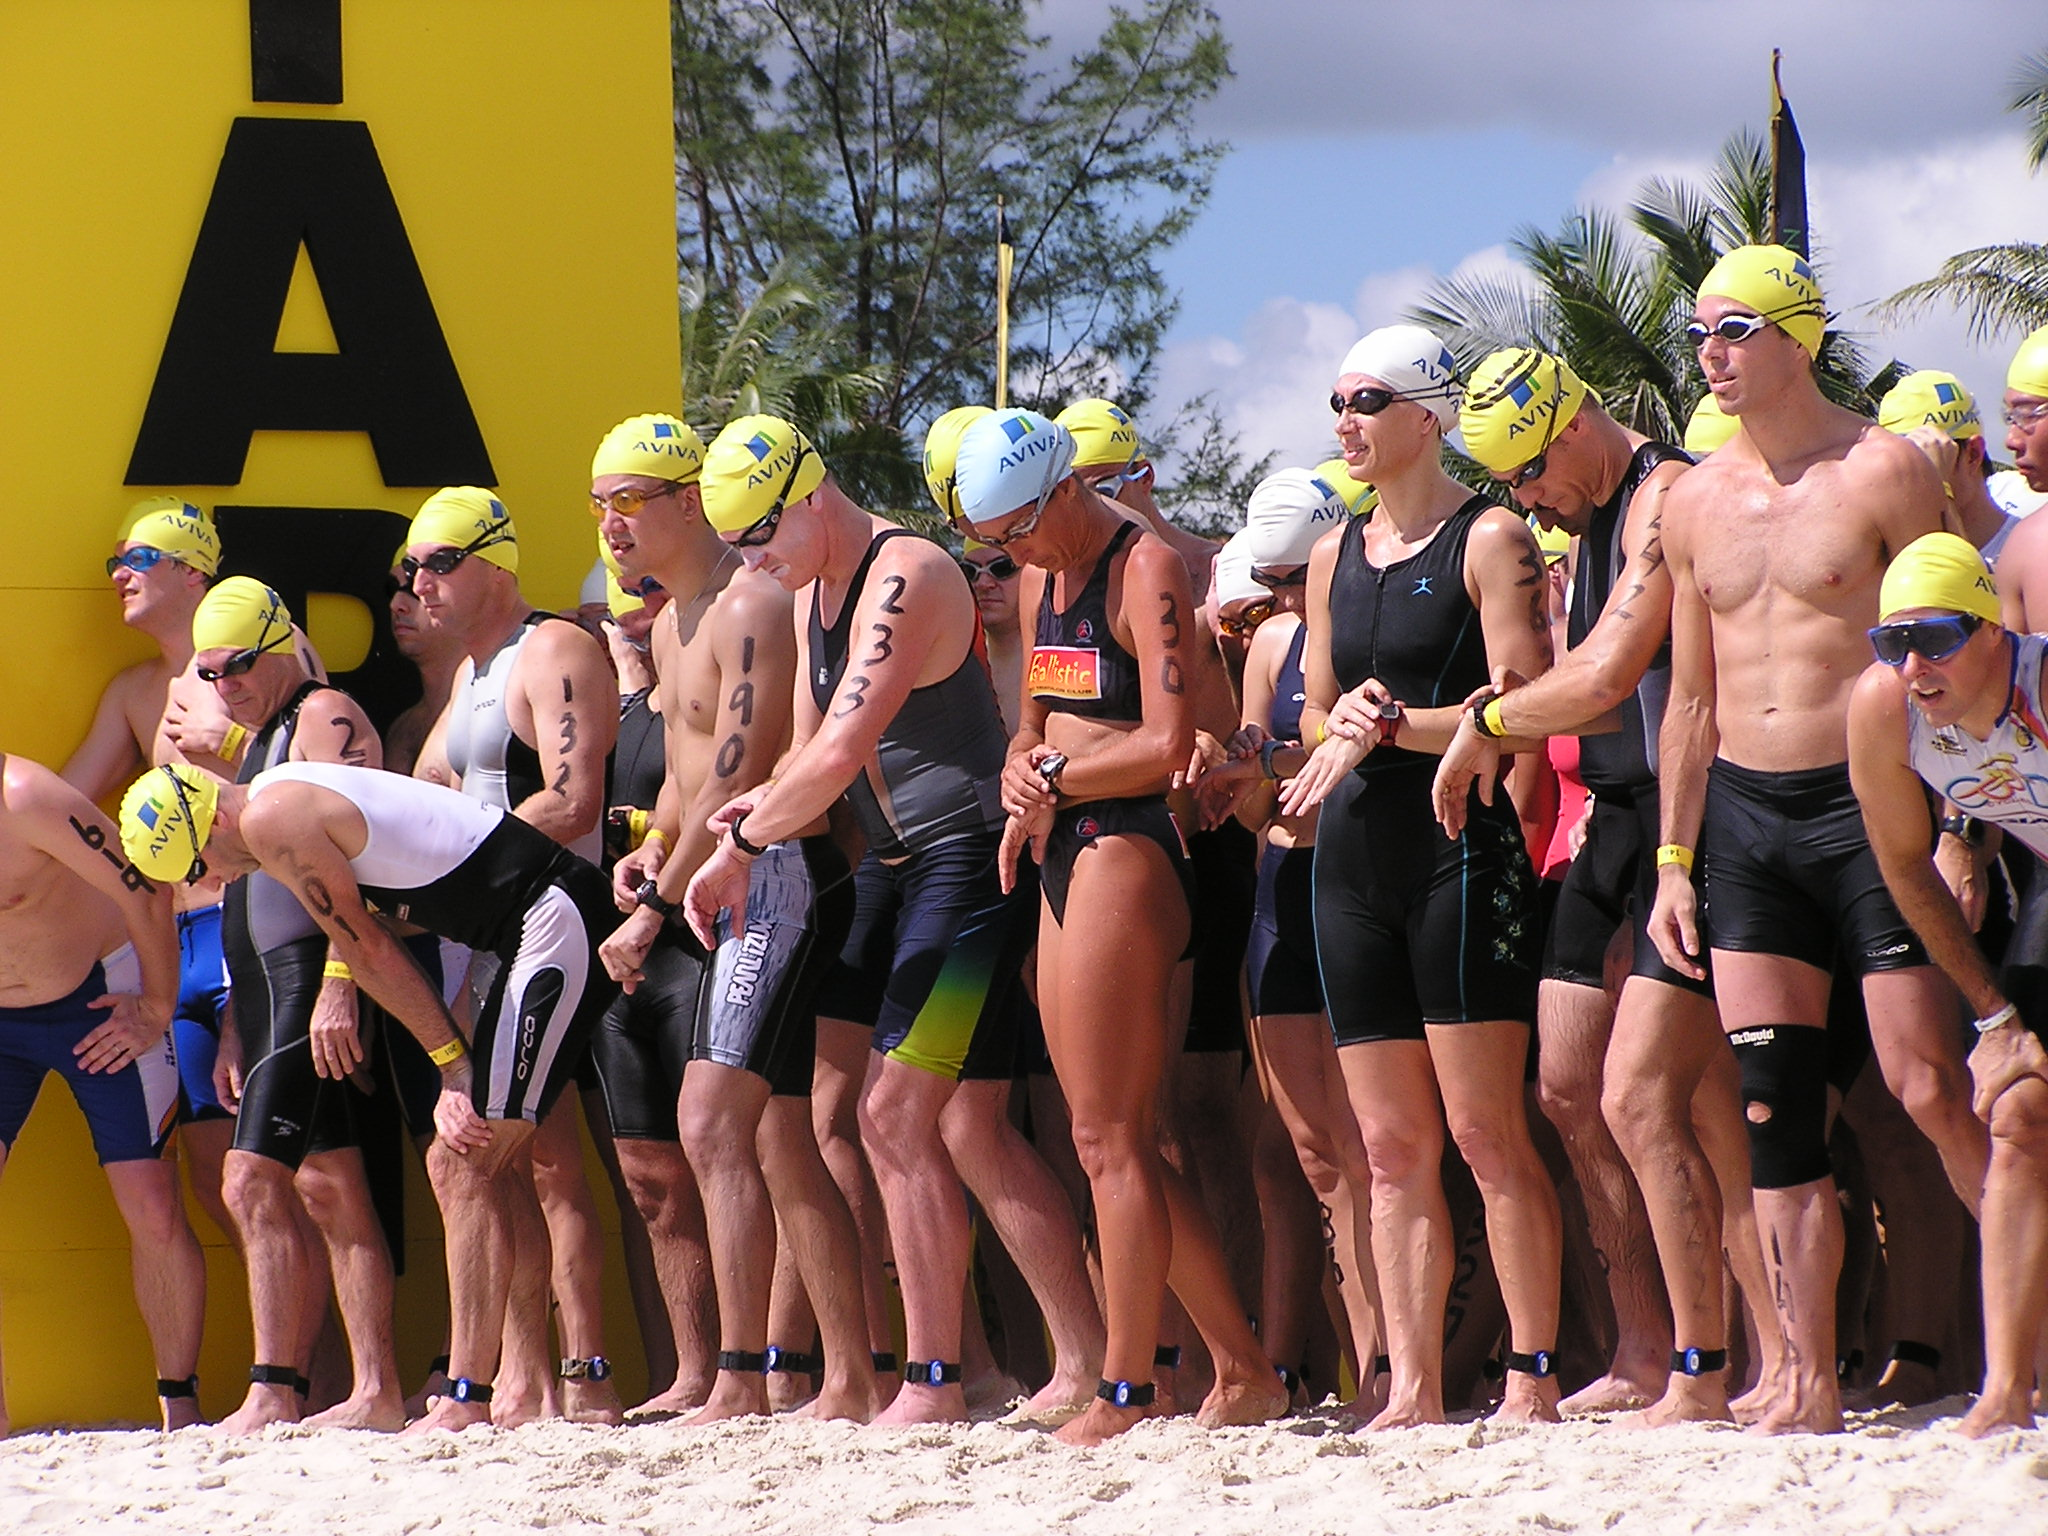 triathlon rfid race timing systems